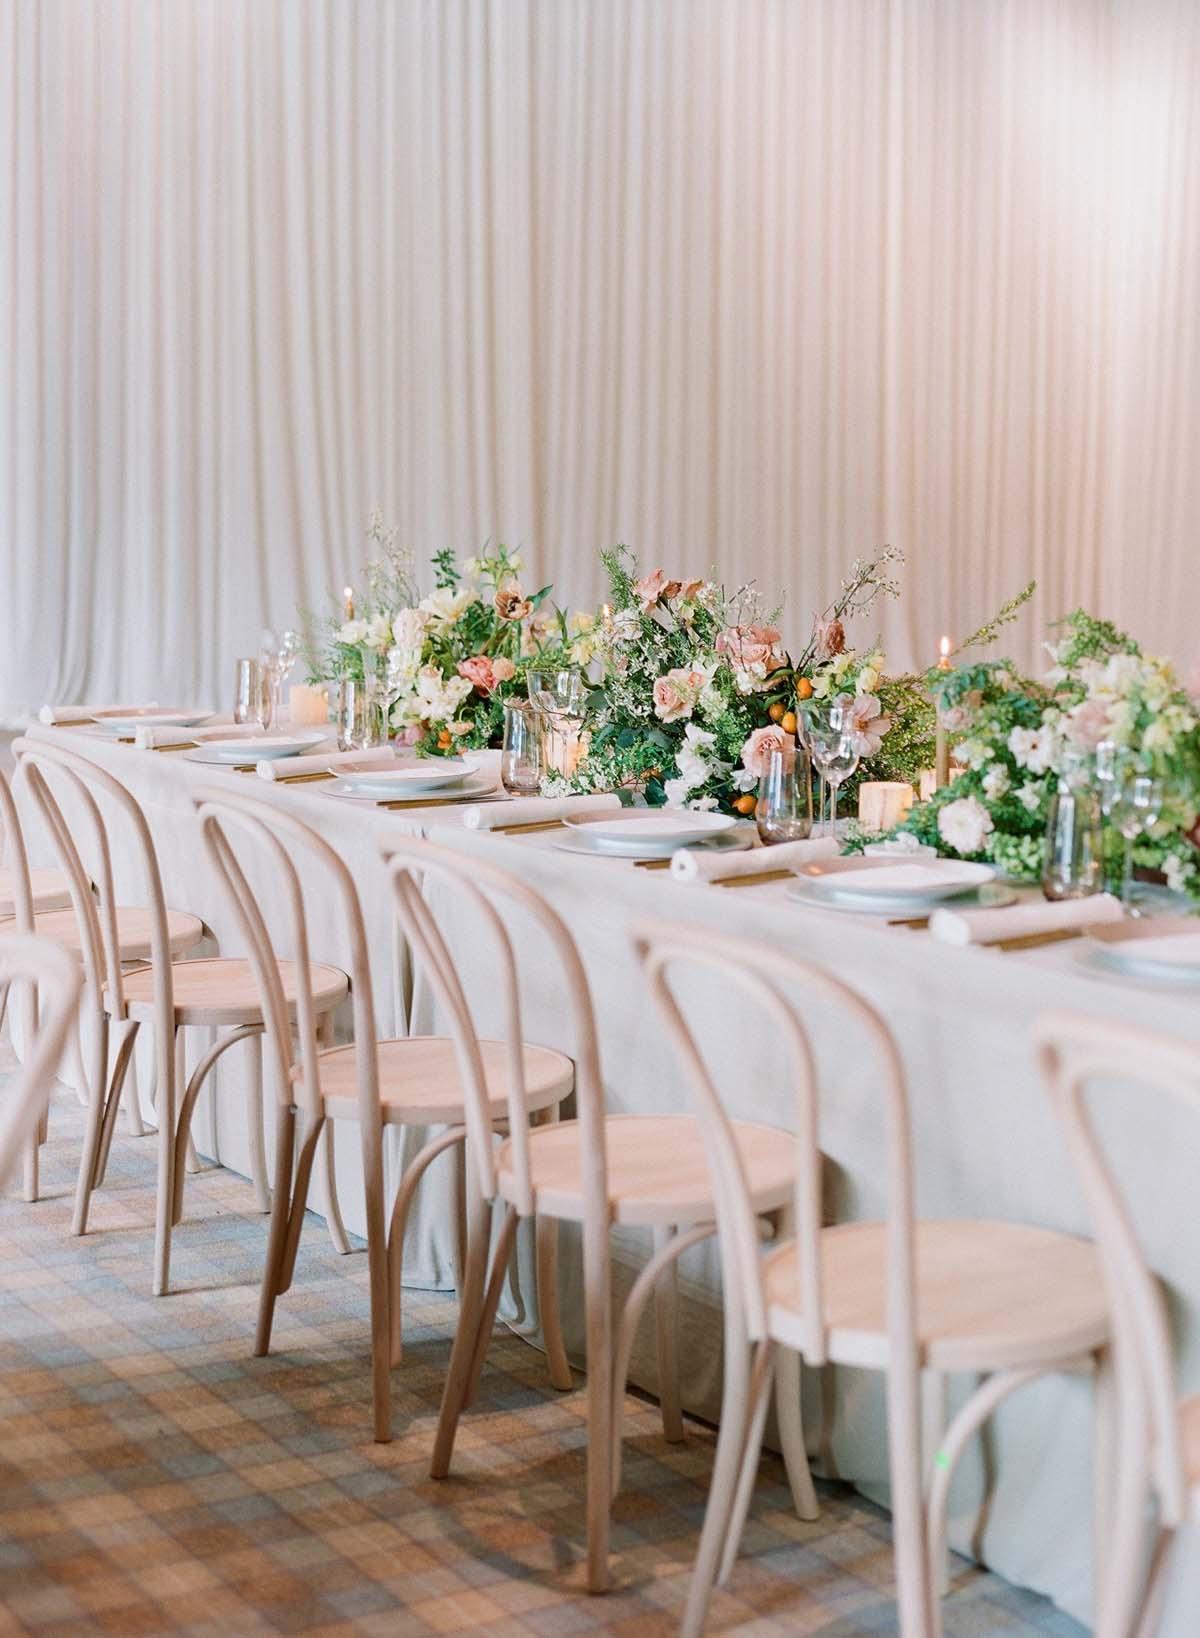 XOXO_BRIDE_Events-Michelle-Beller_Photography_0116